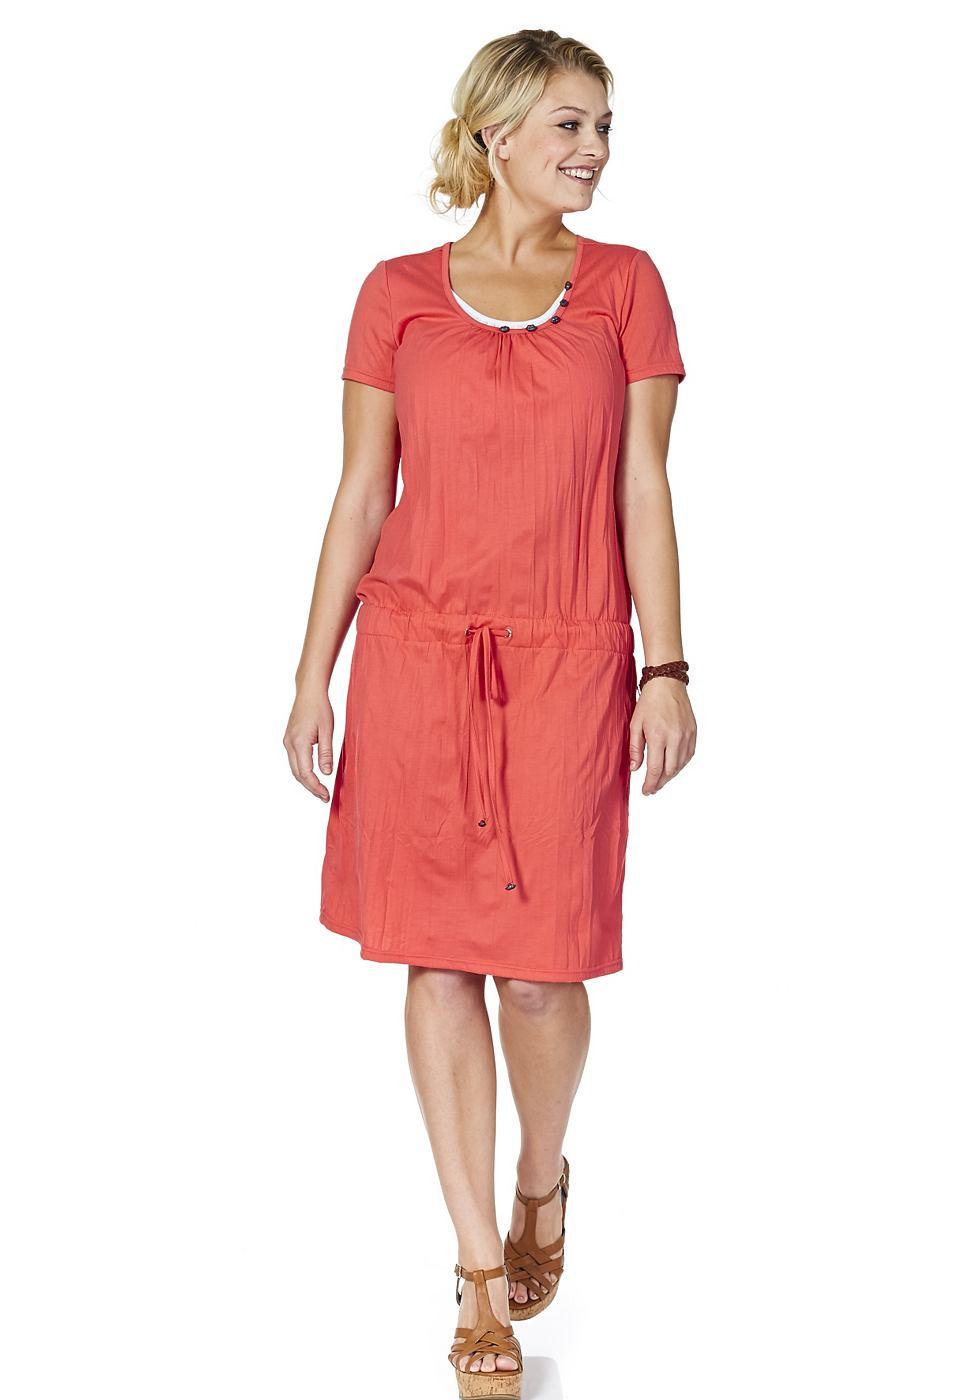 SHEEGO jurk met aandeel katoen rood